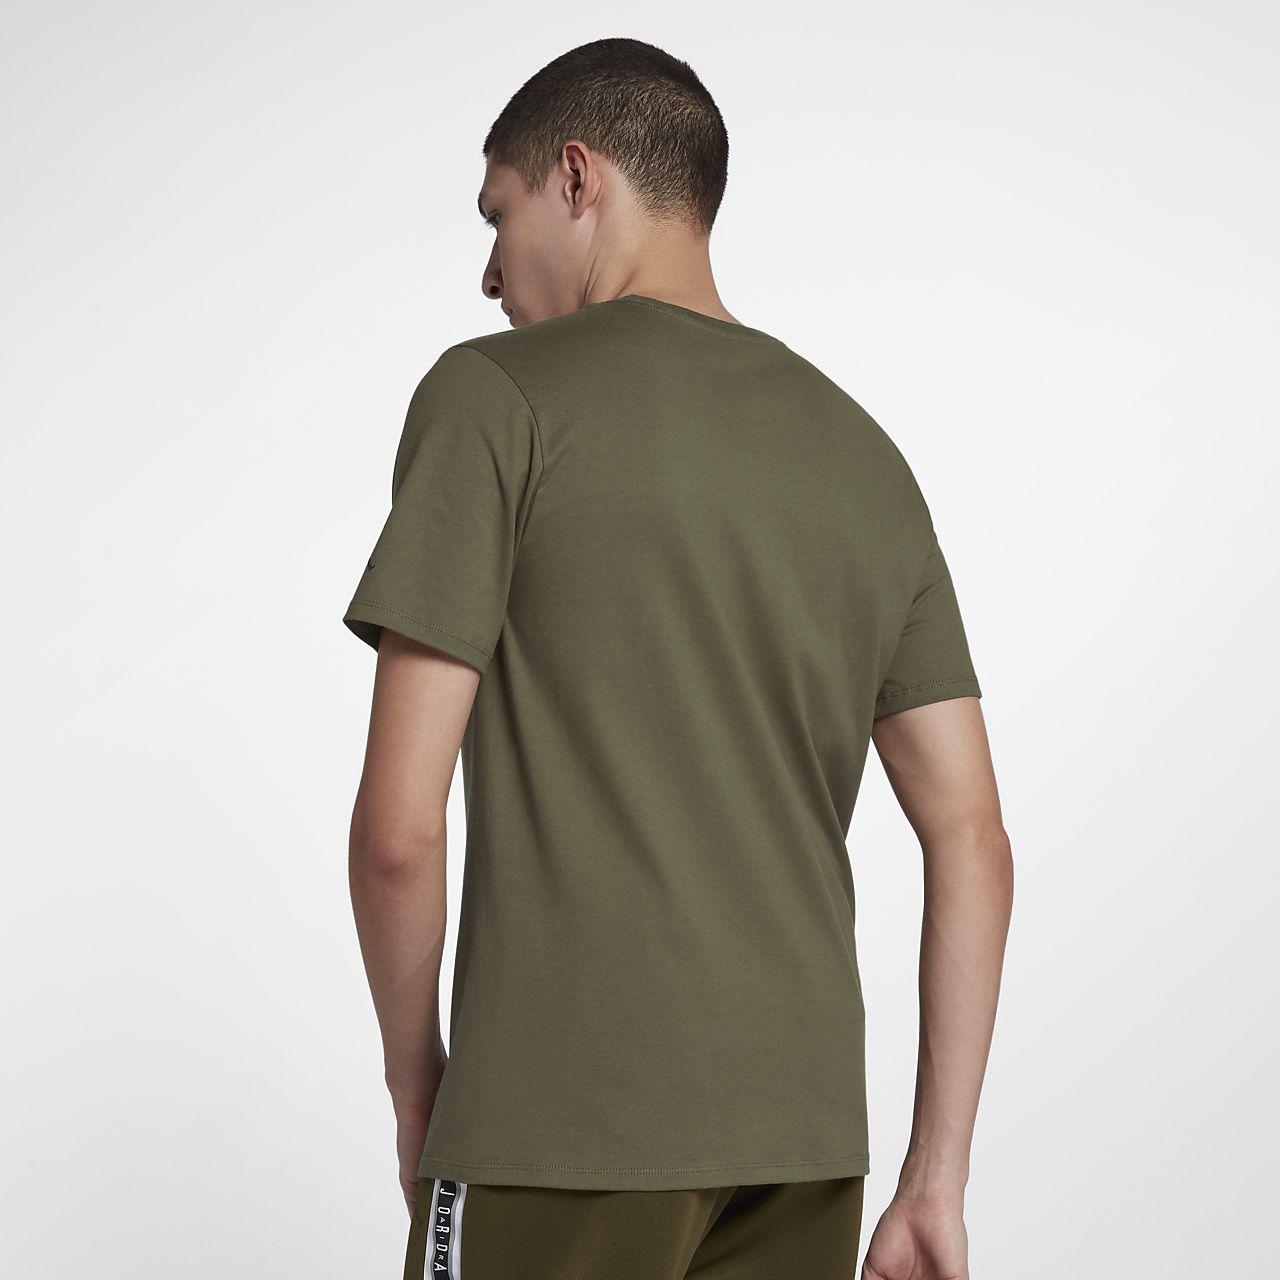 56a27751121e Jordan Sportswear AJ 19 CNXN Men s T-Shirt. Nike.com